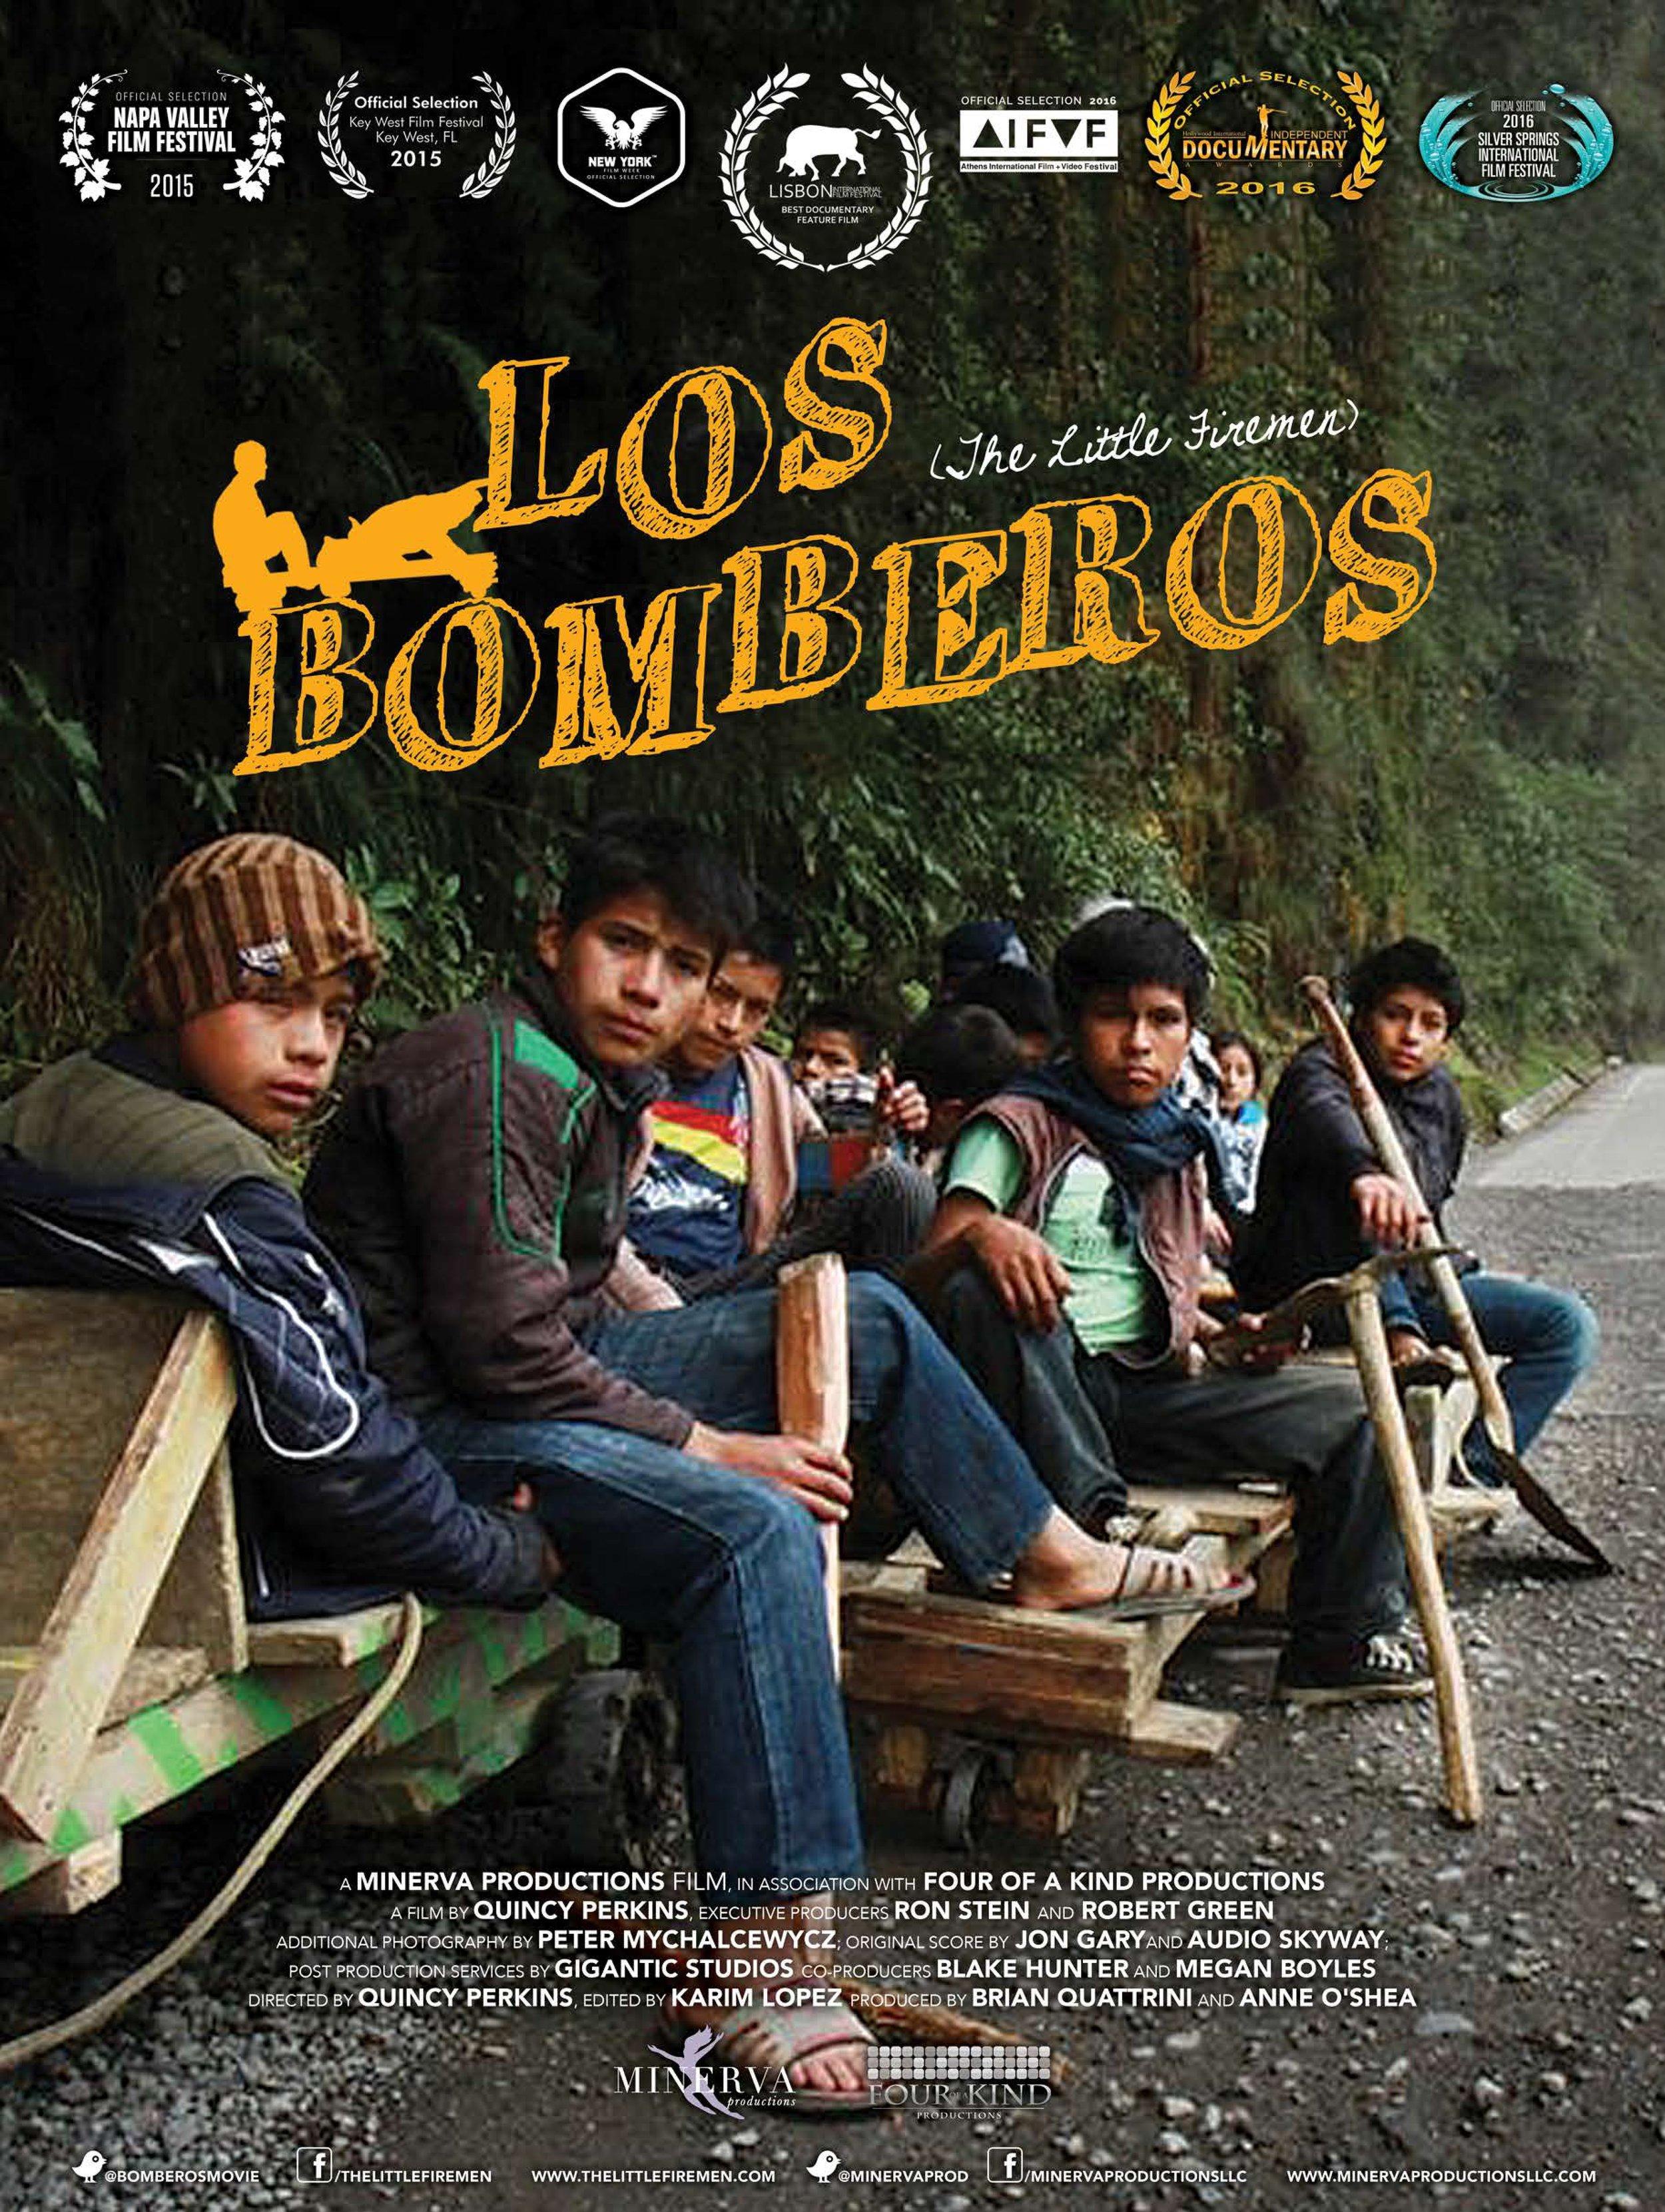 Los_Bomberos_Poster_12x18-page-0.jpg